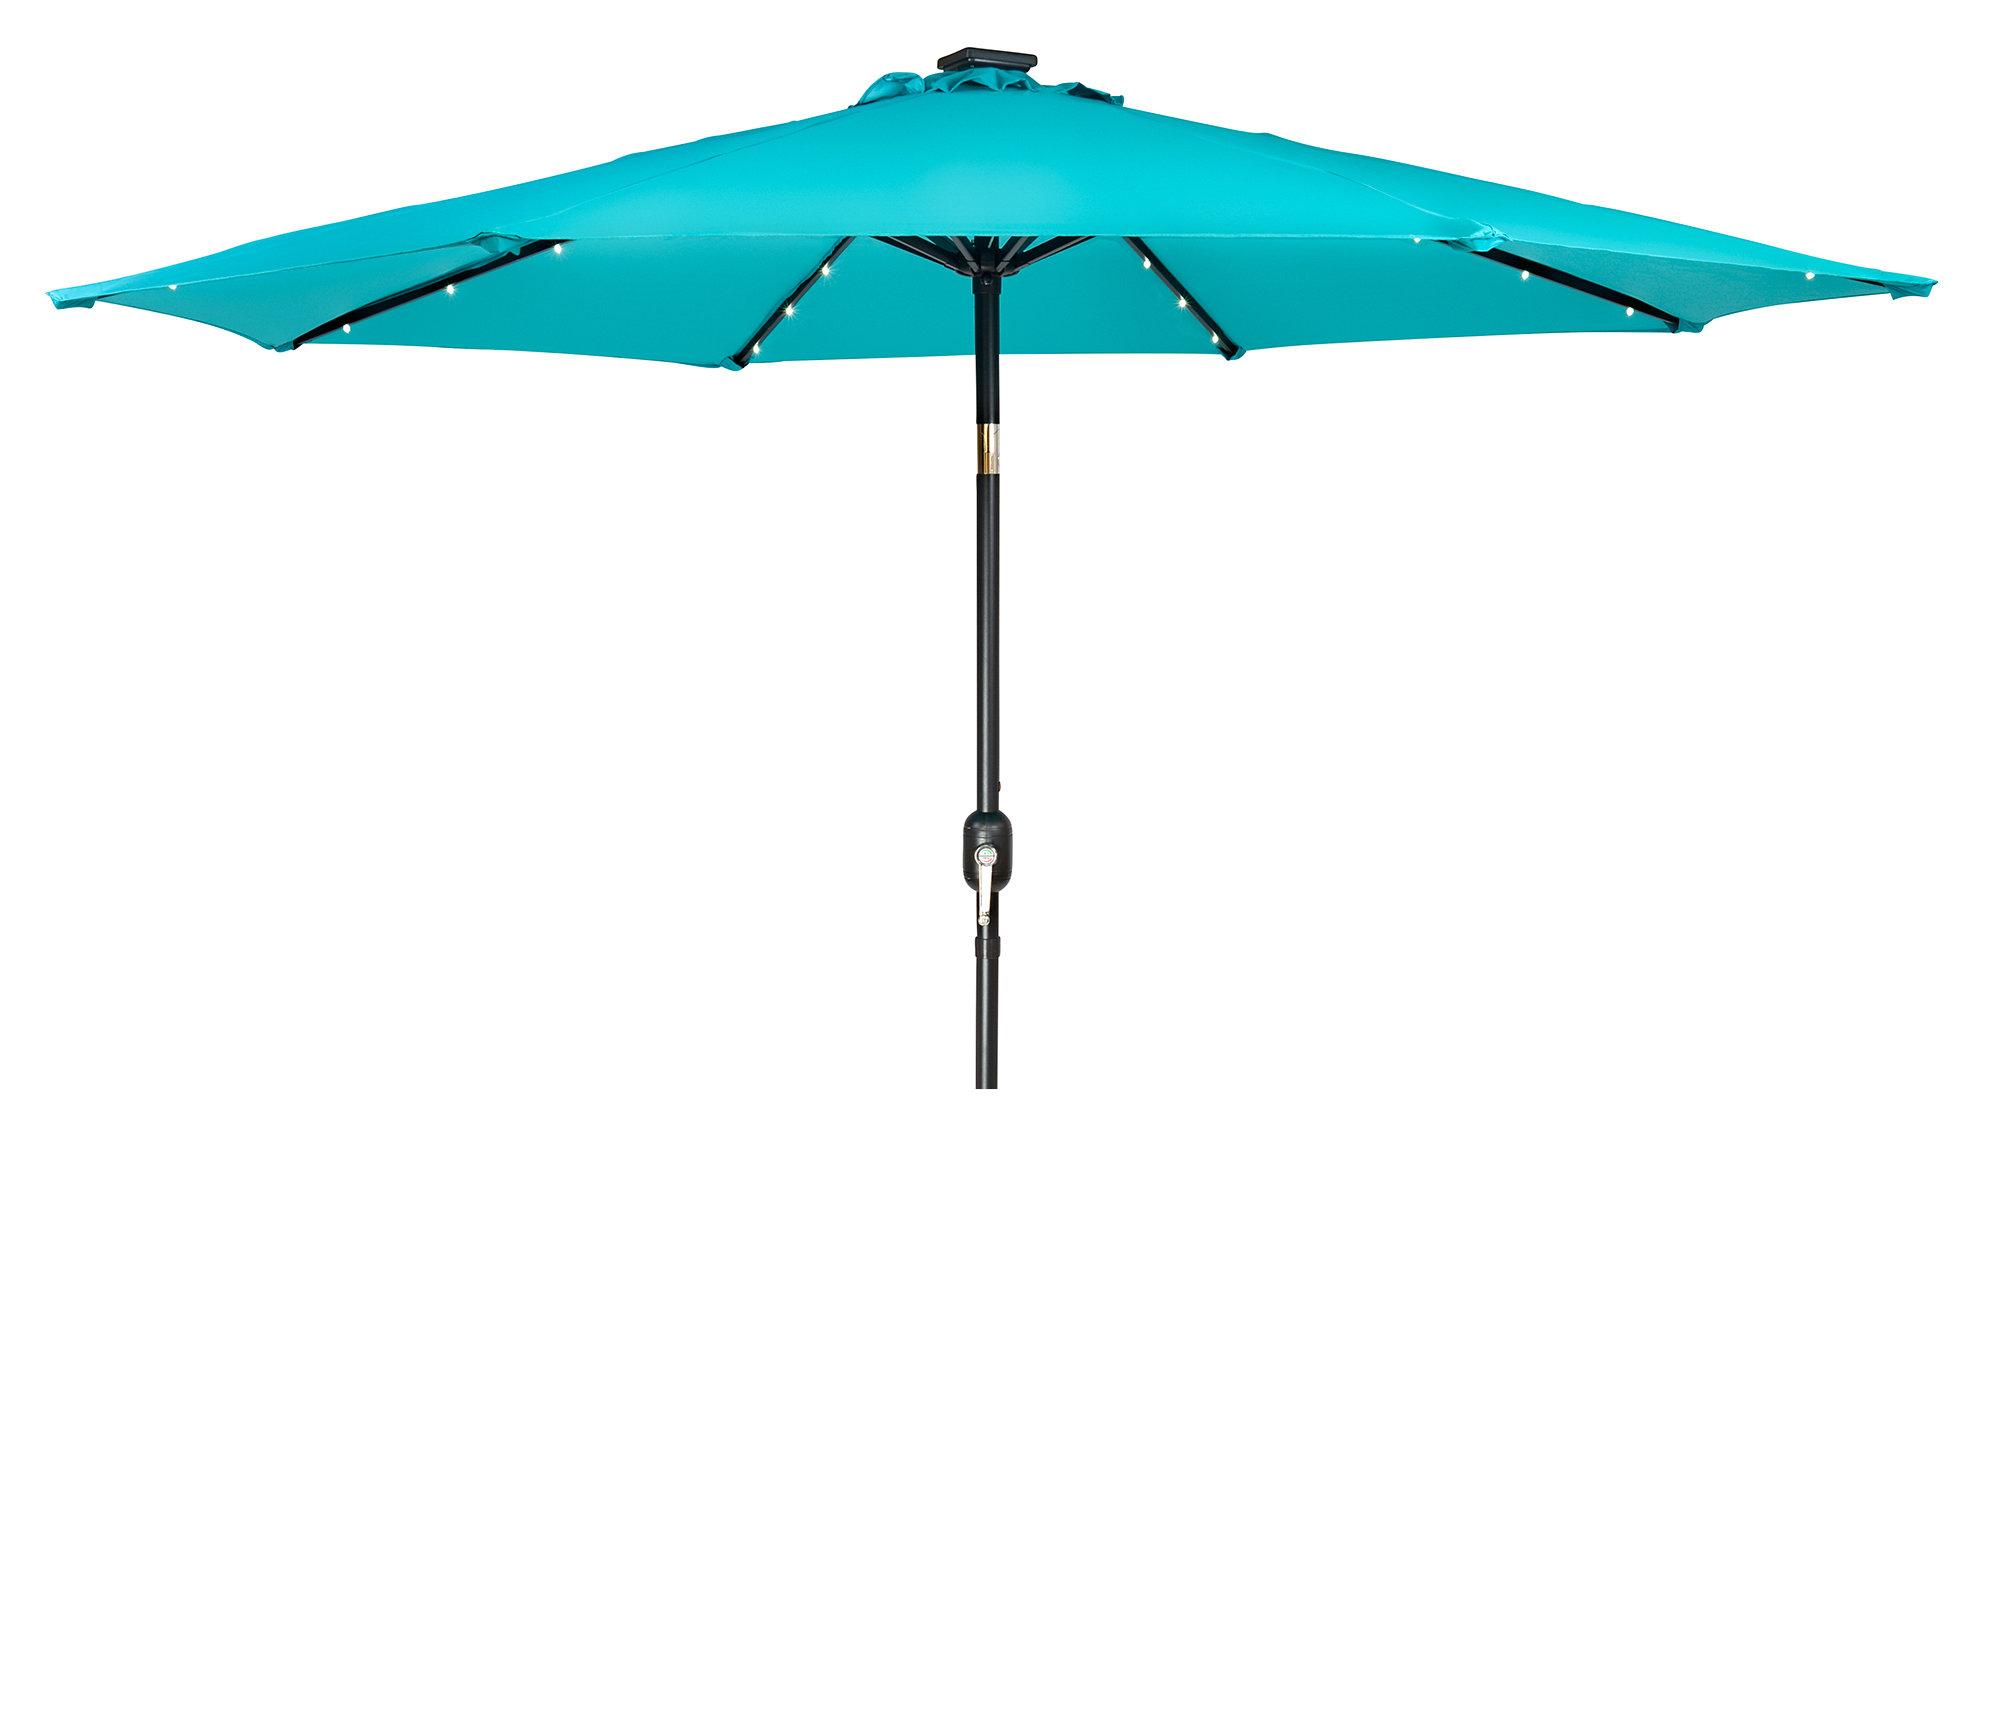 Woll Lighted Market Umbrellas Pertaining To Most Popular Woll 9' Lighted Market Umbrella (View 3 of 20)